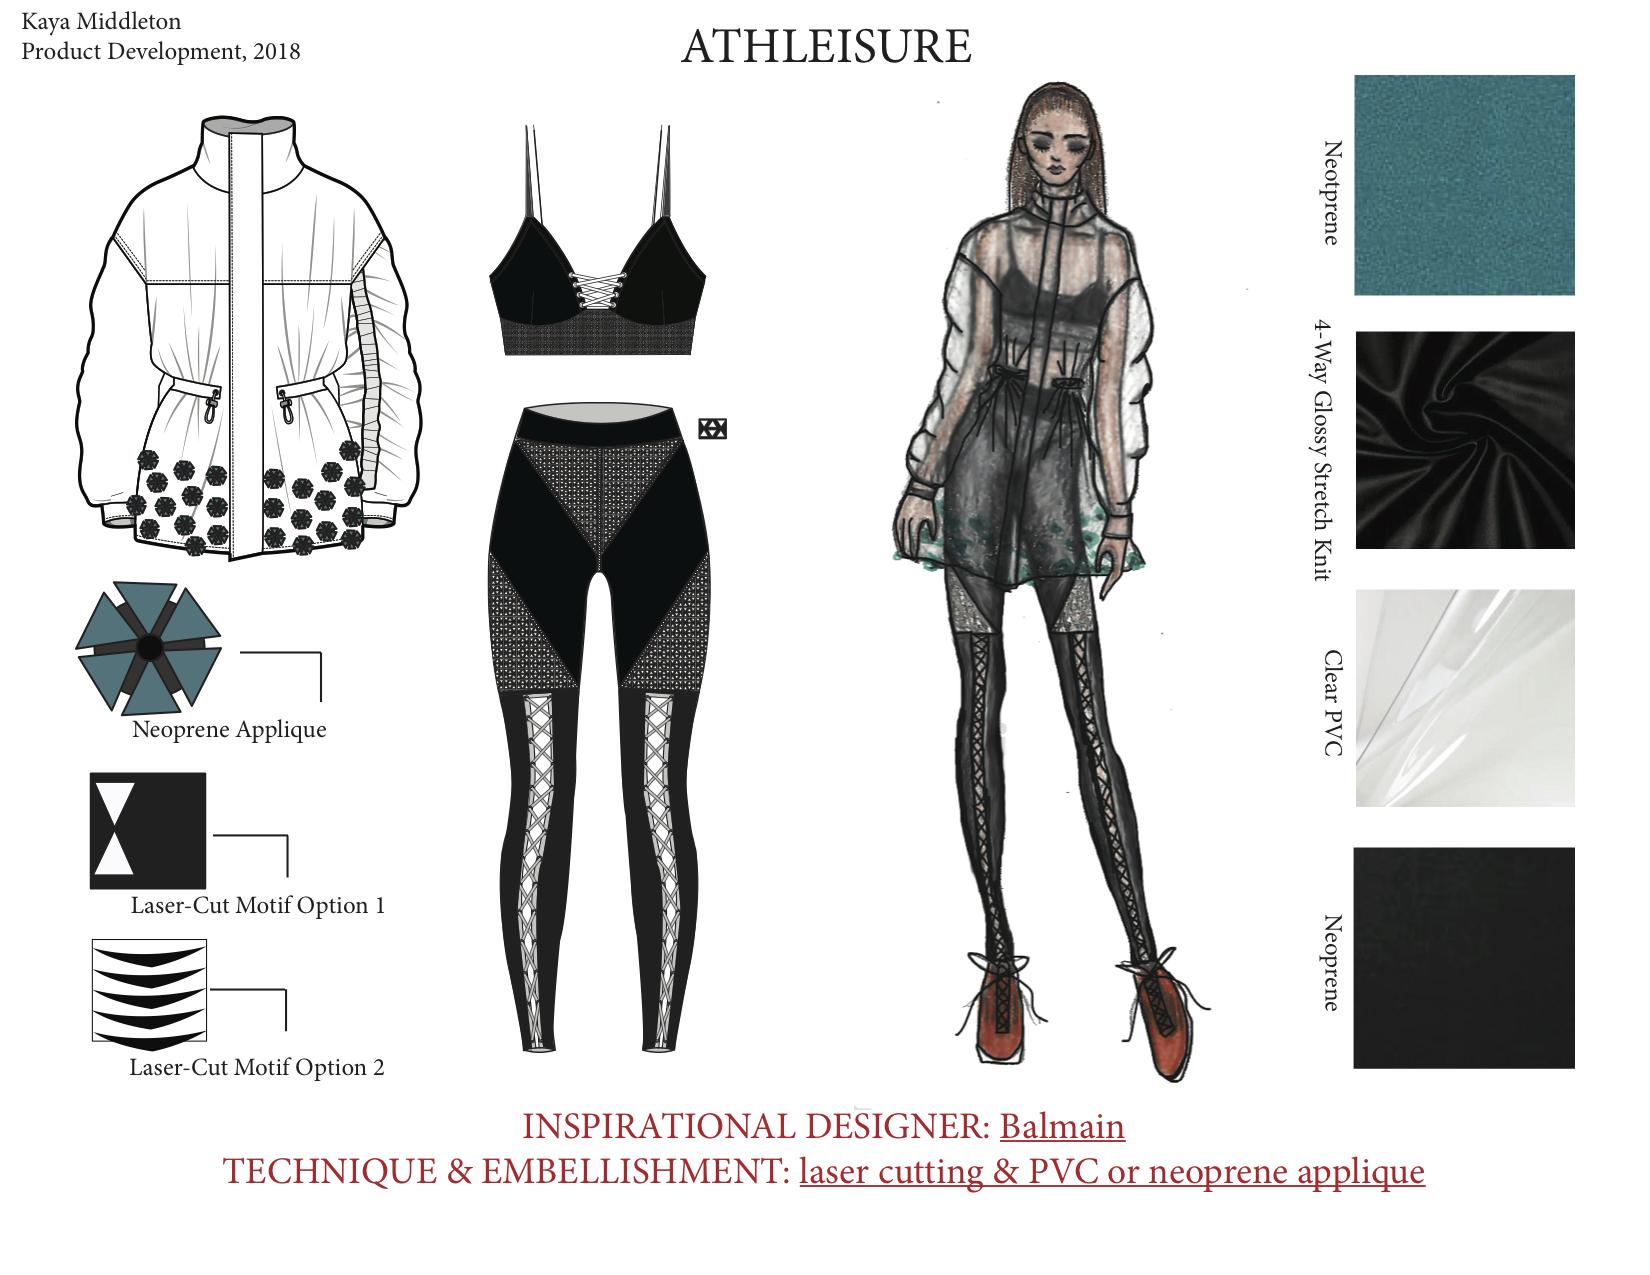 Fashion Cad Flats Illustrations Kaymid